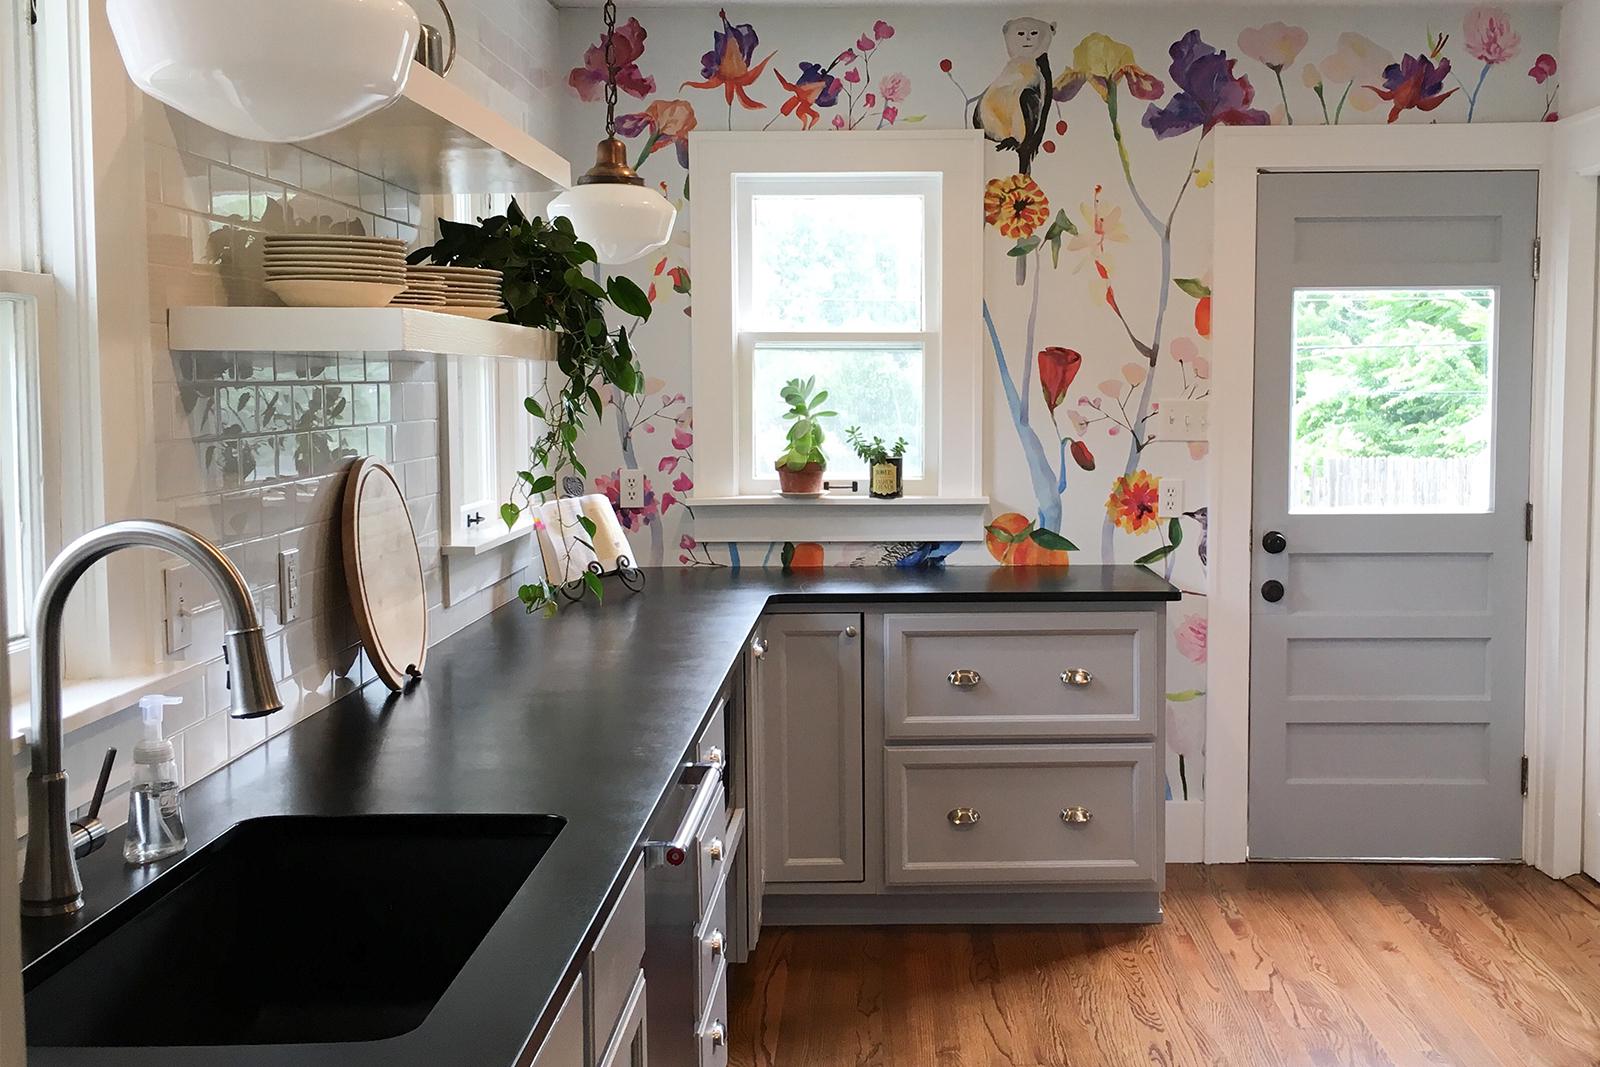 plan kitchen remodel | houselogic kitchen remodeling tips